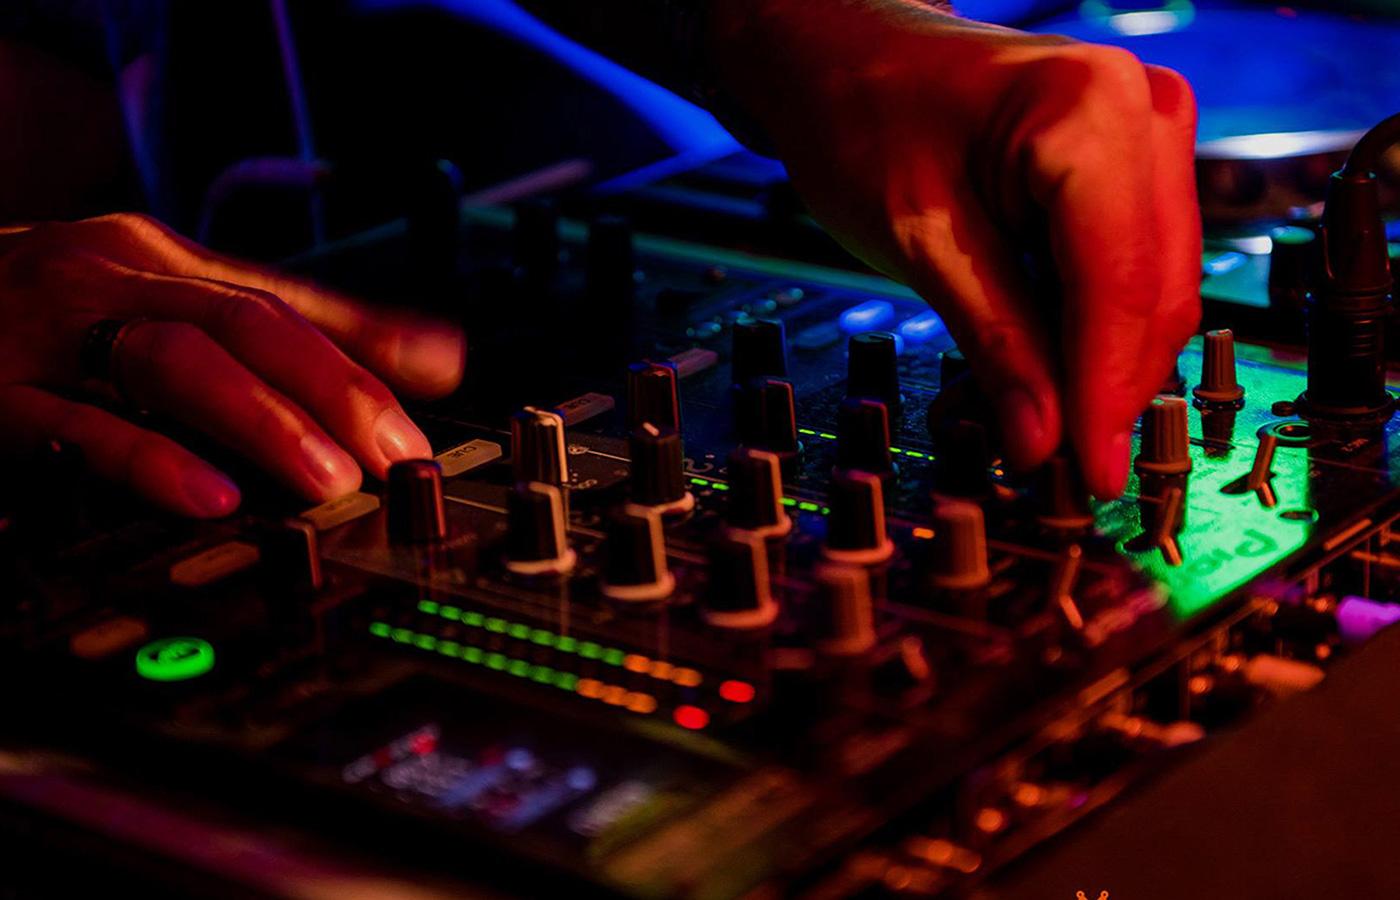 360 entertainment DJ mixing